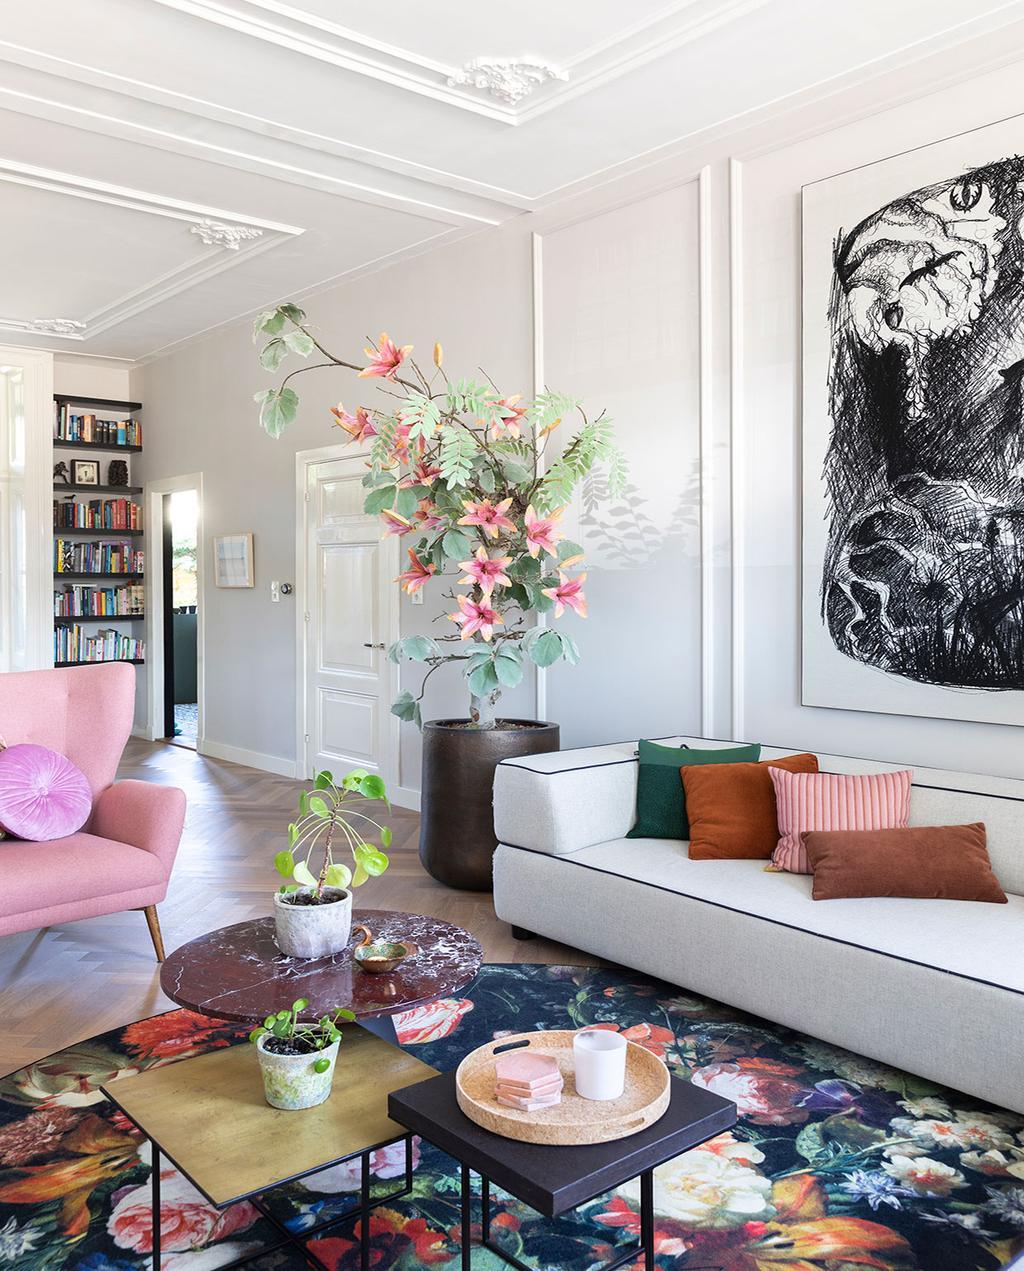 vtwonen 01-2021 | woonkamer met witte bank en roze fauteuil